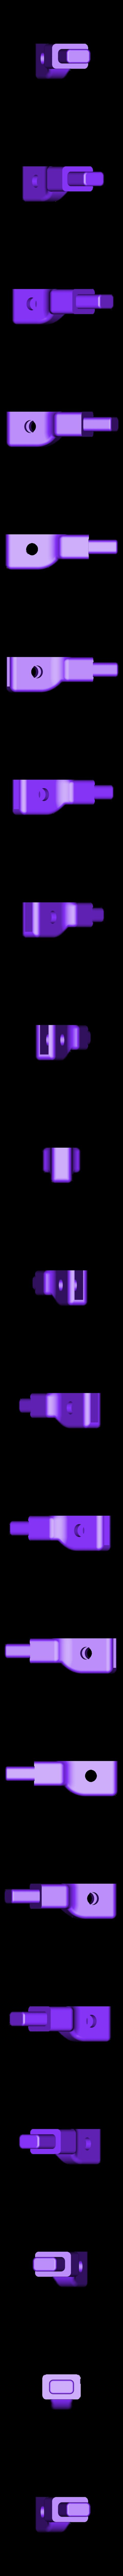 Pièce2.STL Download free STL file Shower shampoo holder • 3D printable template, CedricRoy